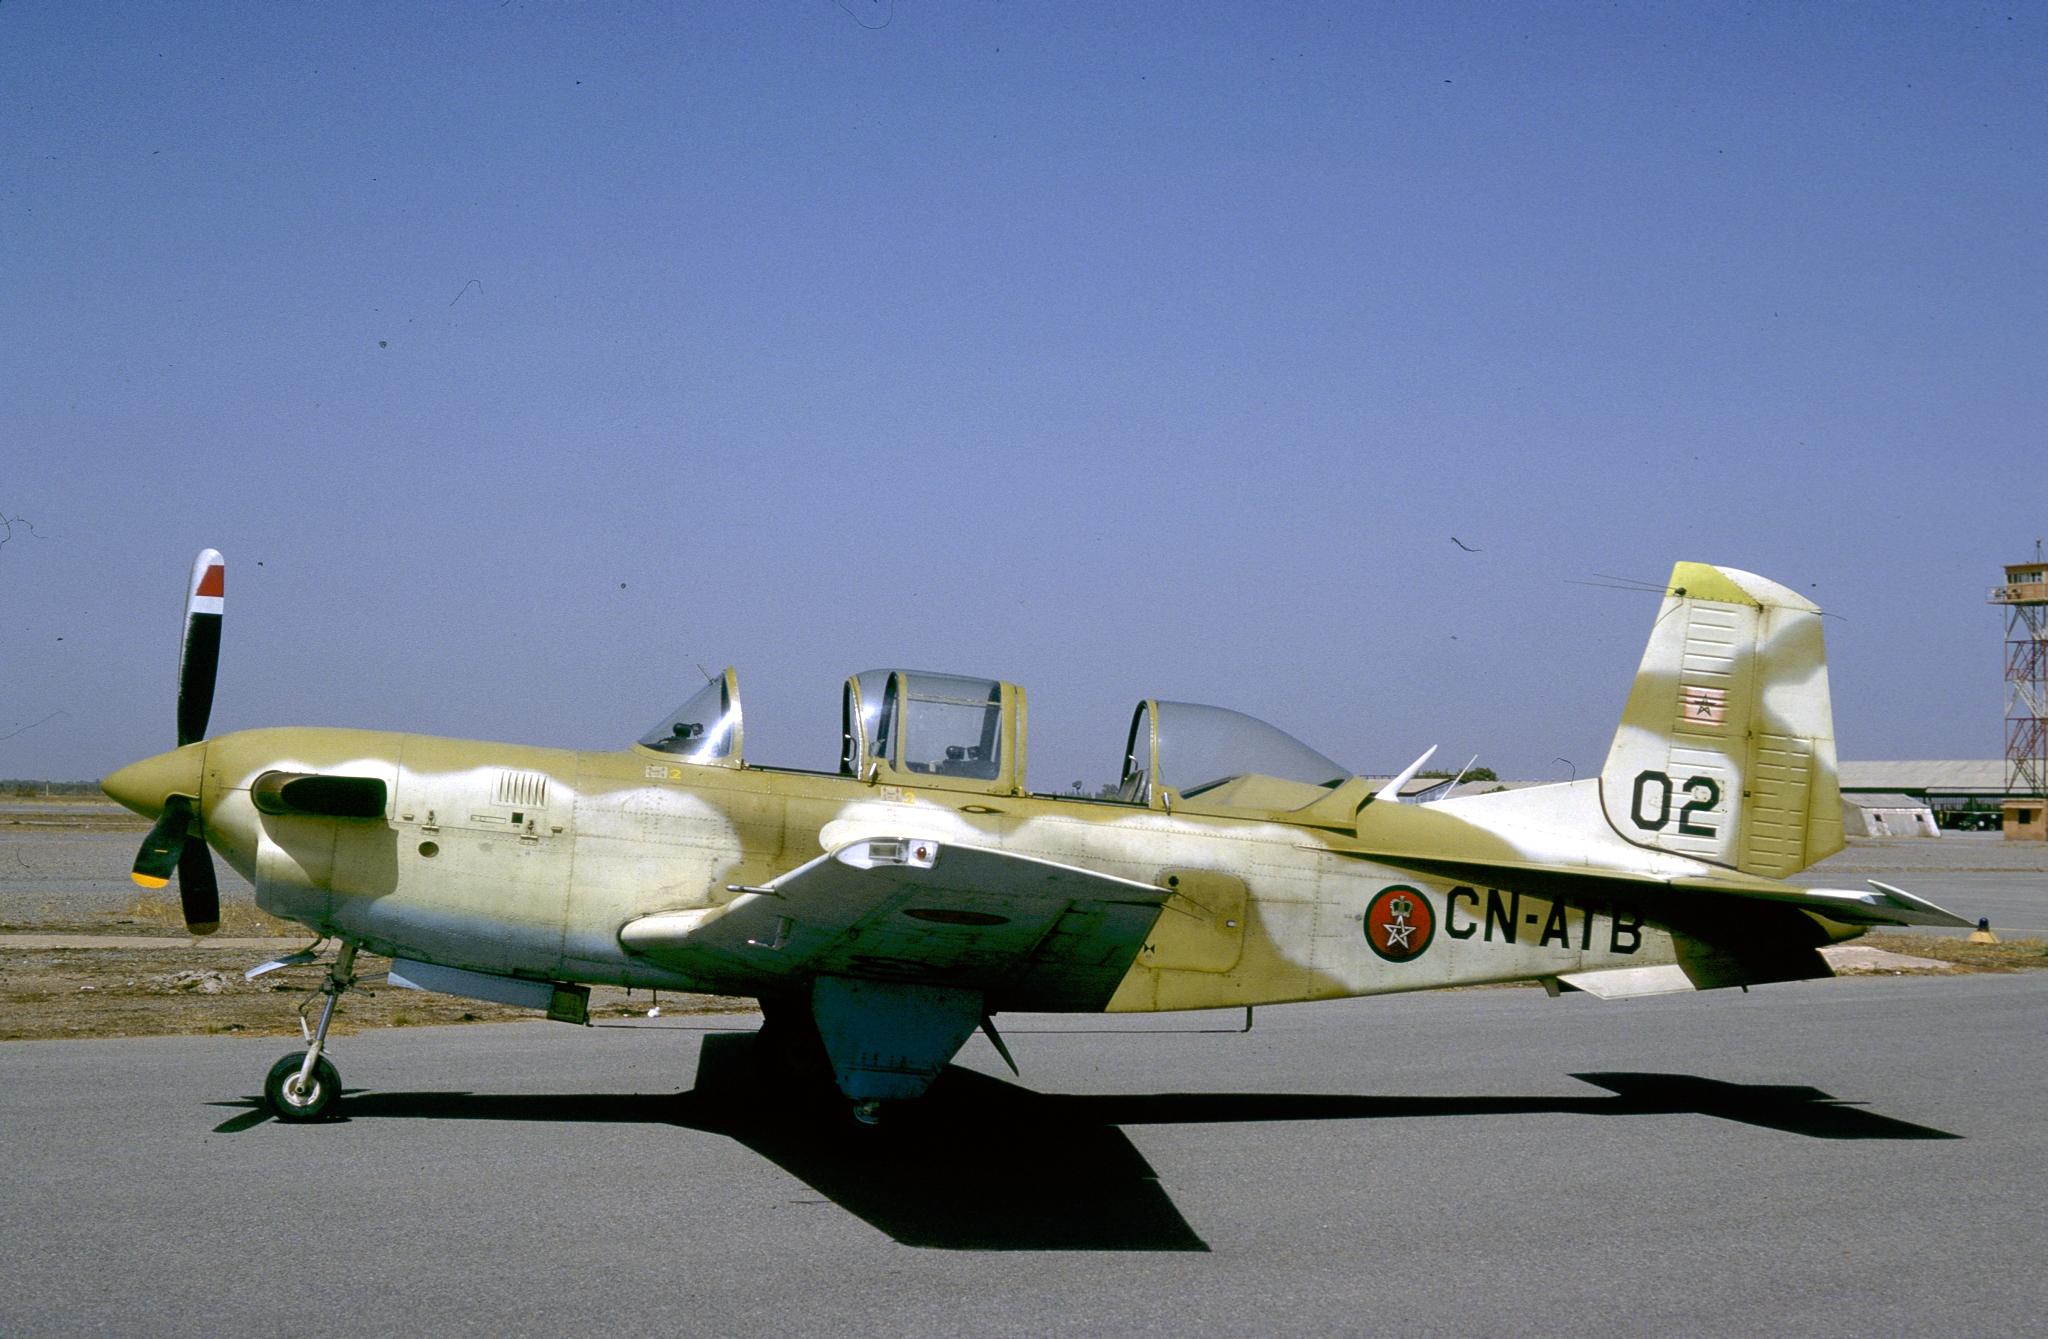 FRA: Photos anciens avions des FRA - Page 7 151226025350788926